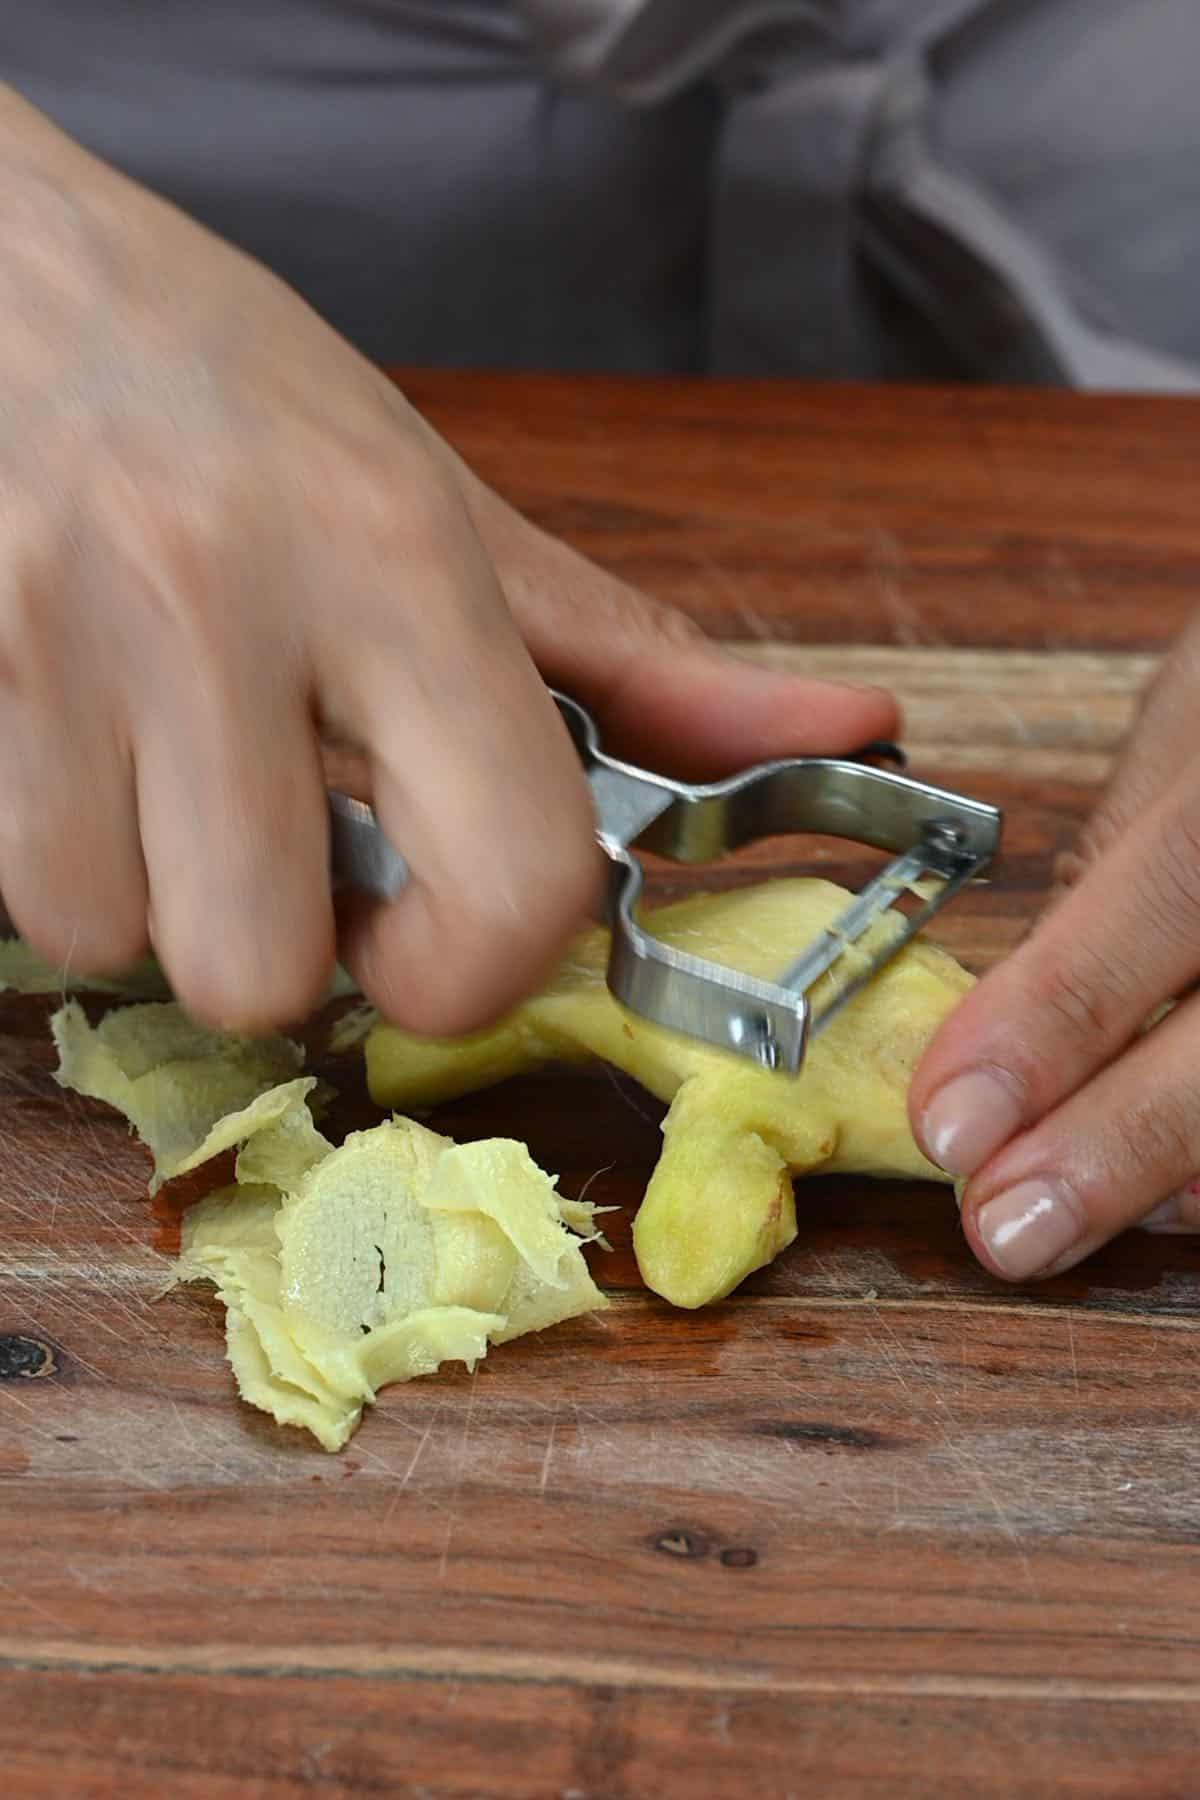 Making thin ginger slices